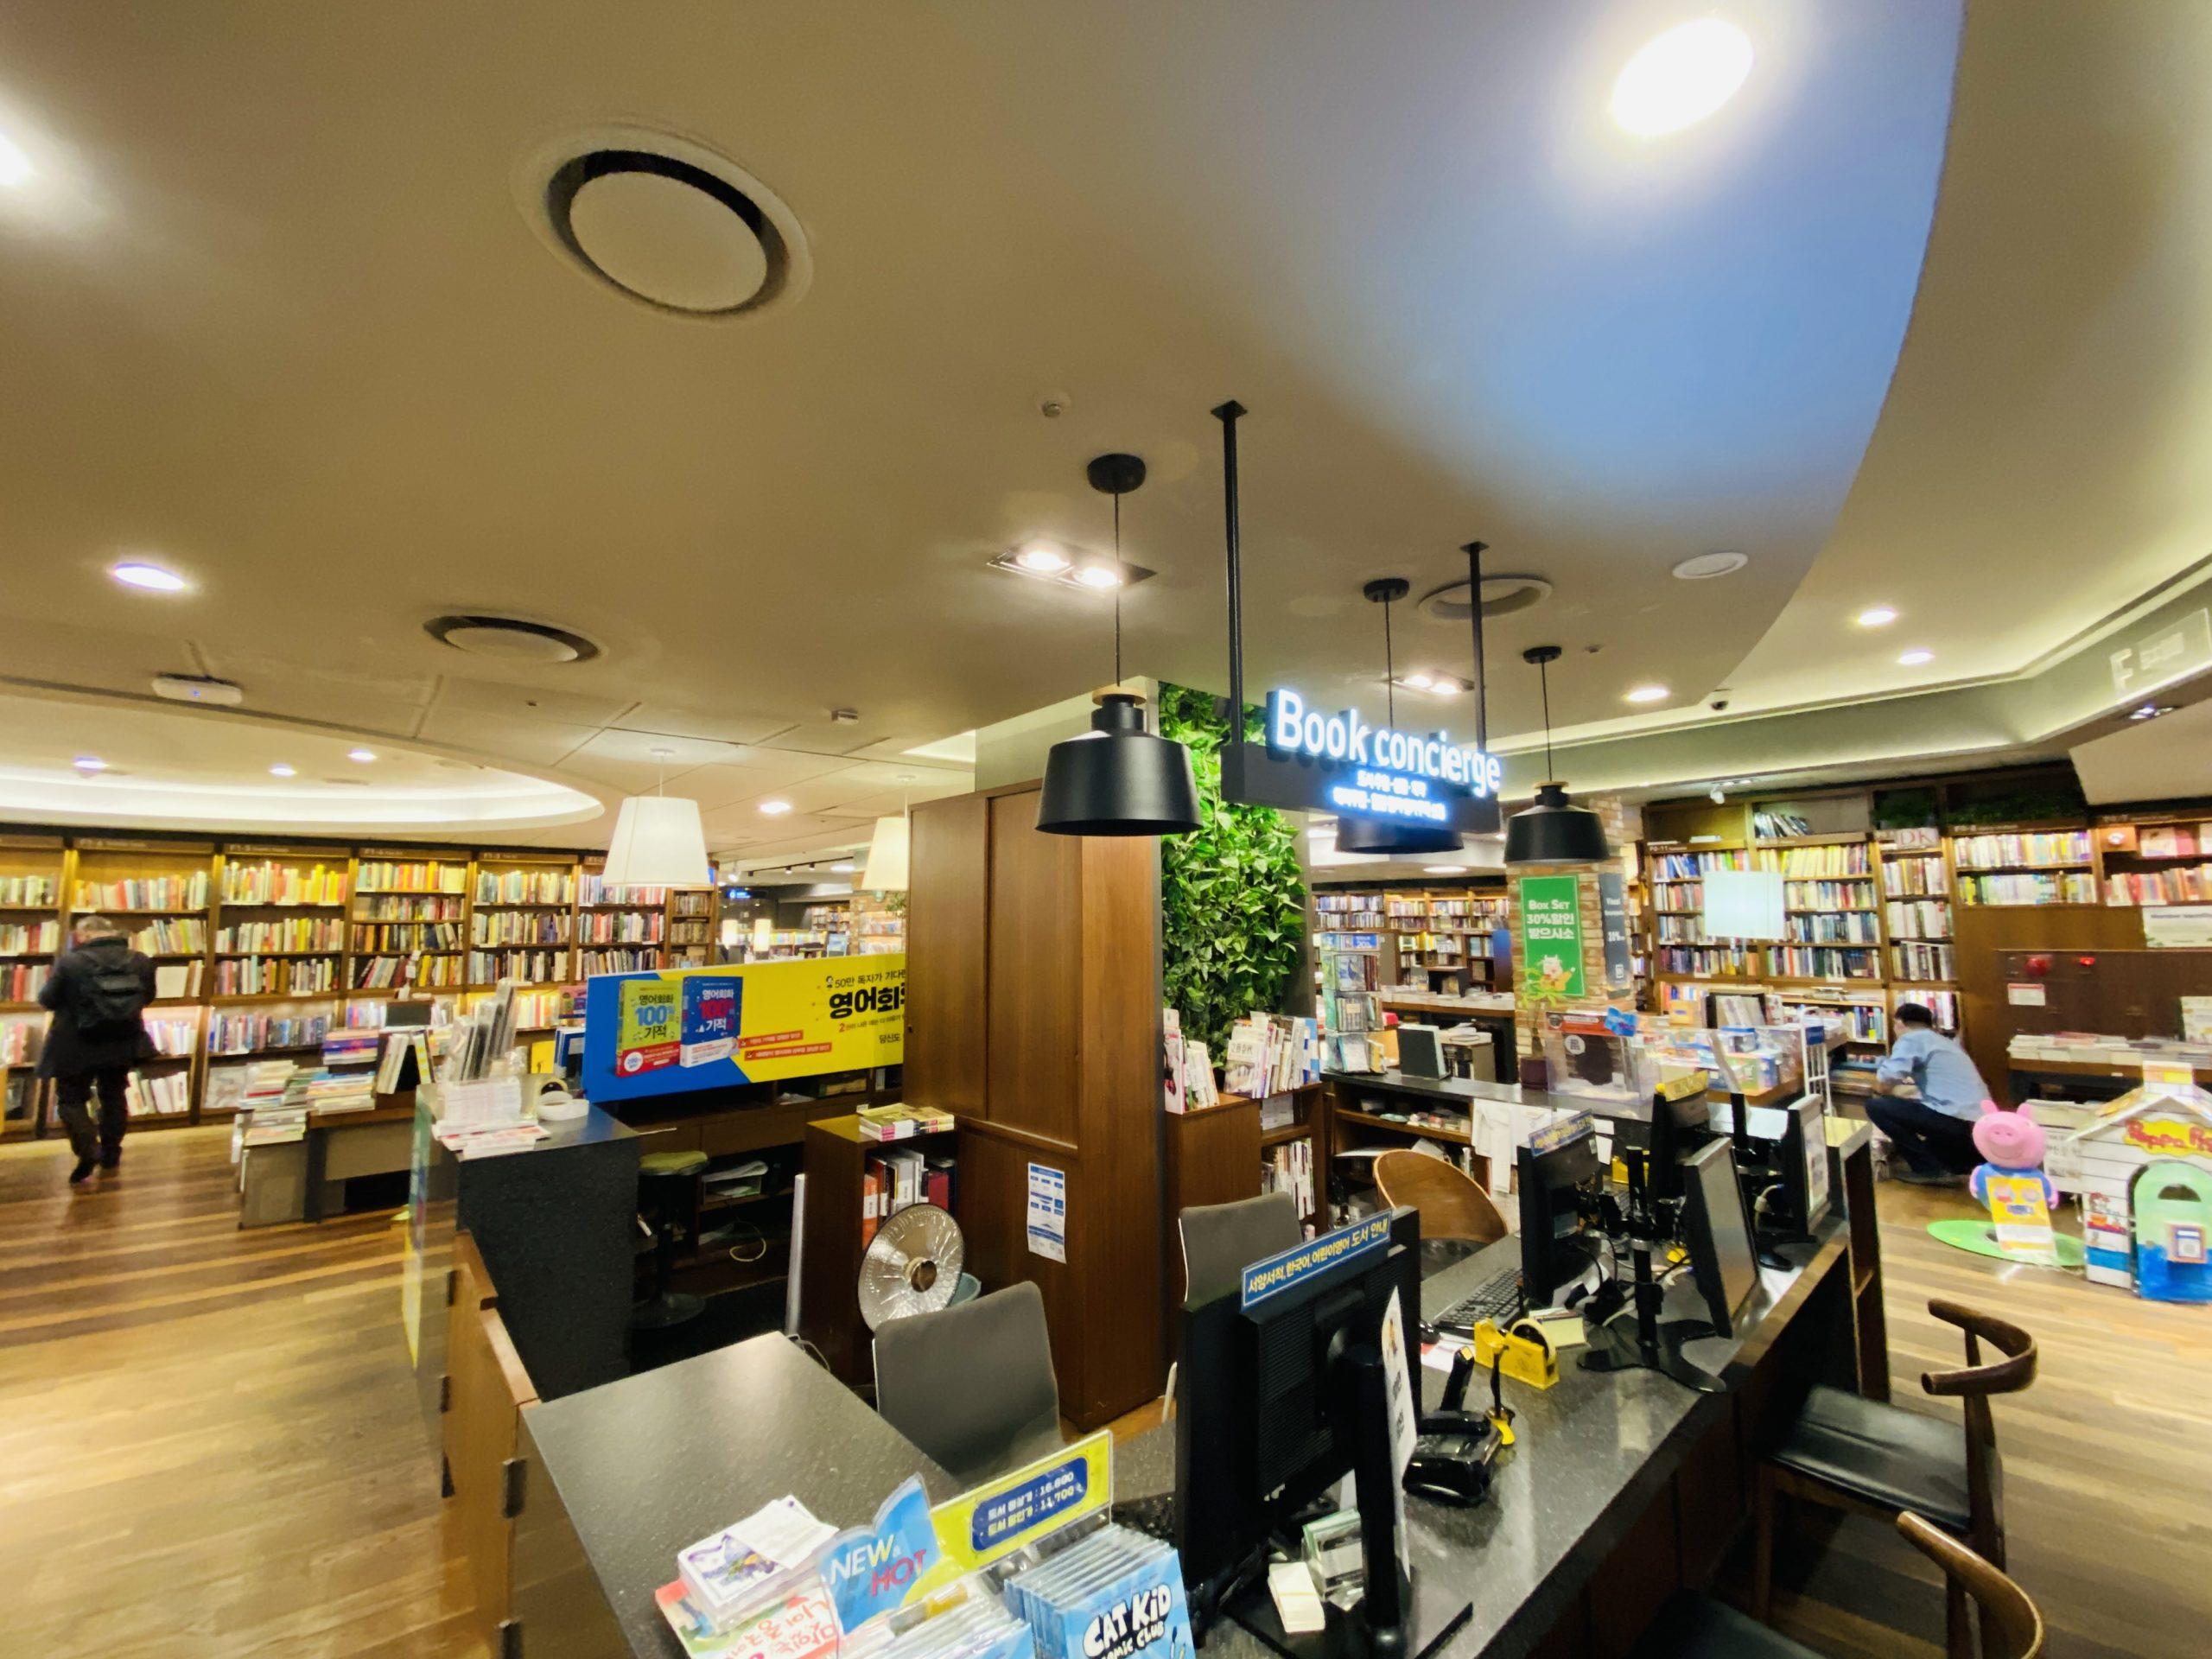 Korea's Largest Bookstore Chain: Kyobo Bookstore